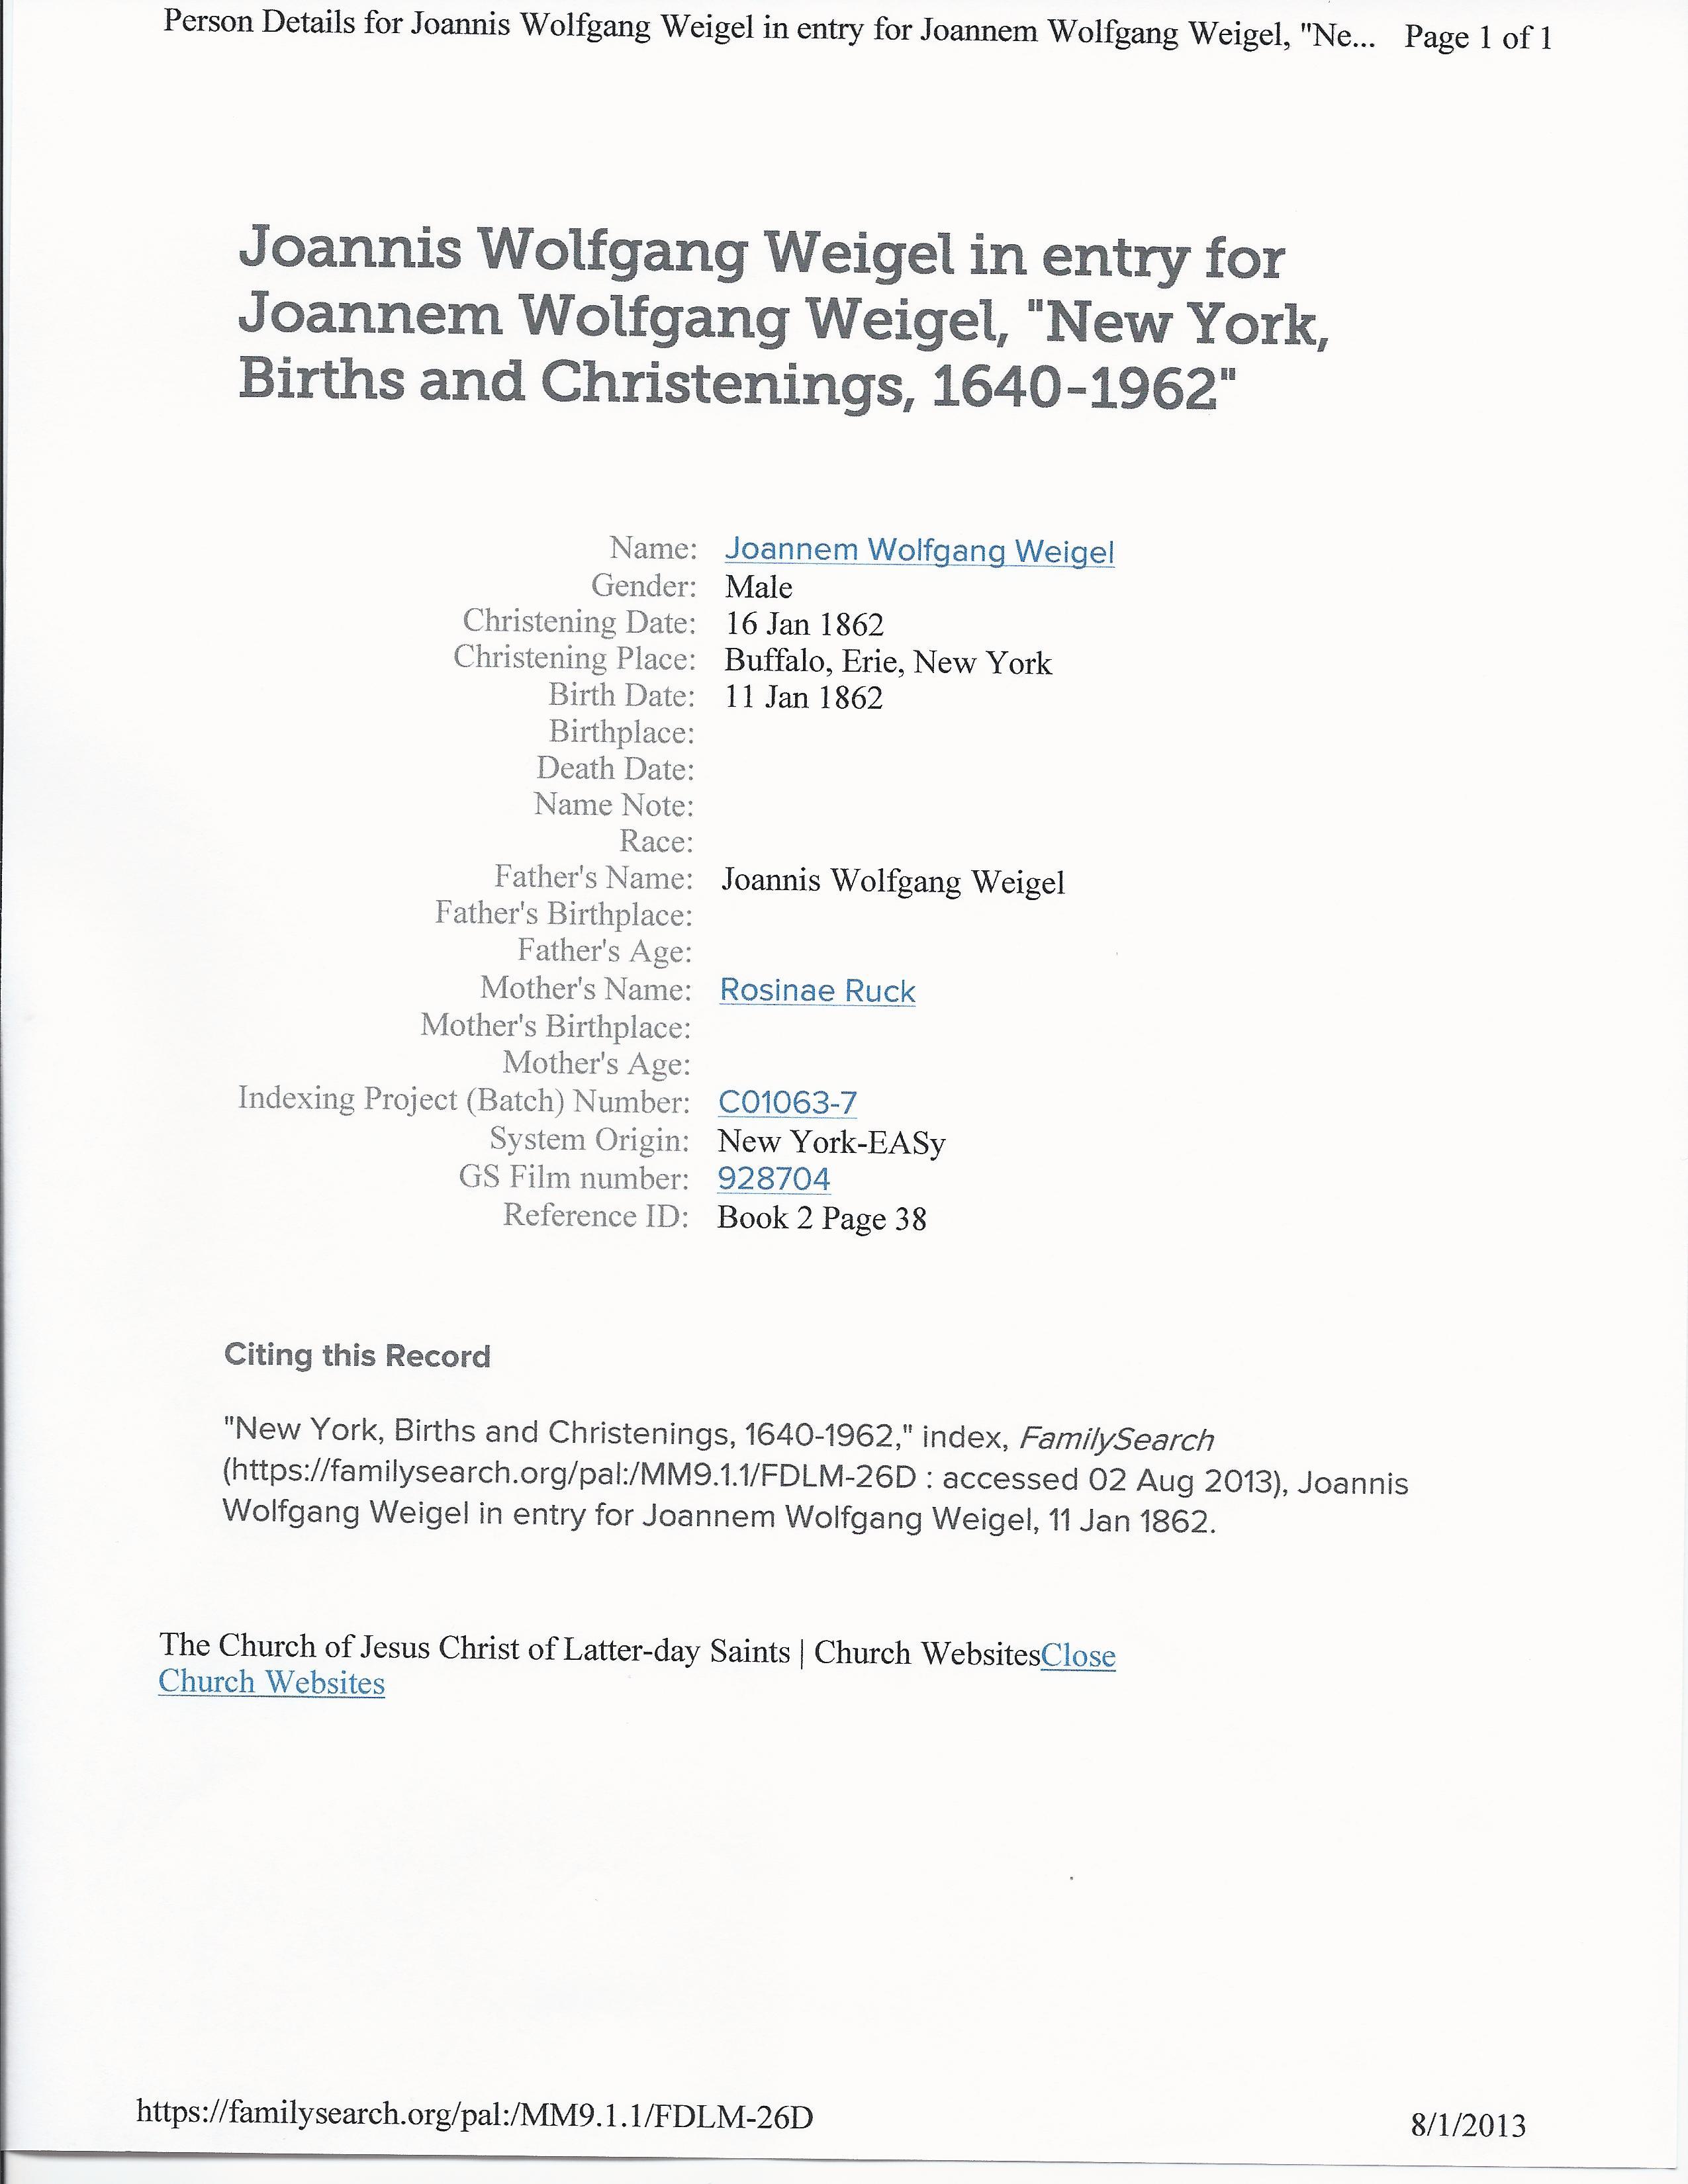 John Wolfgang Weigel